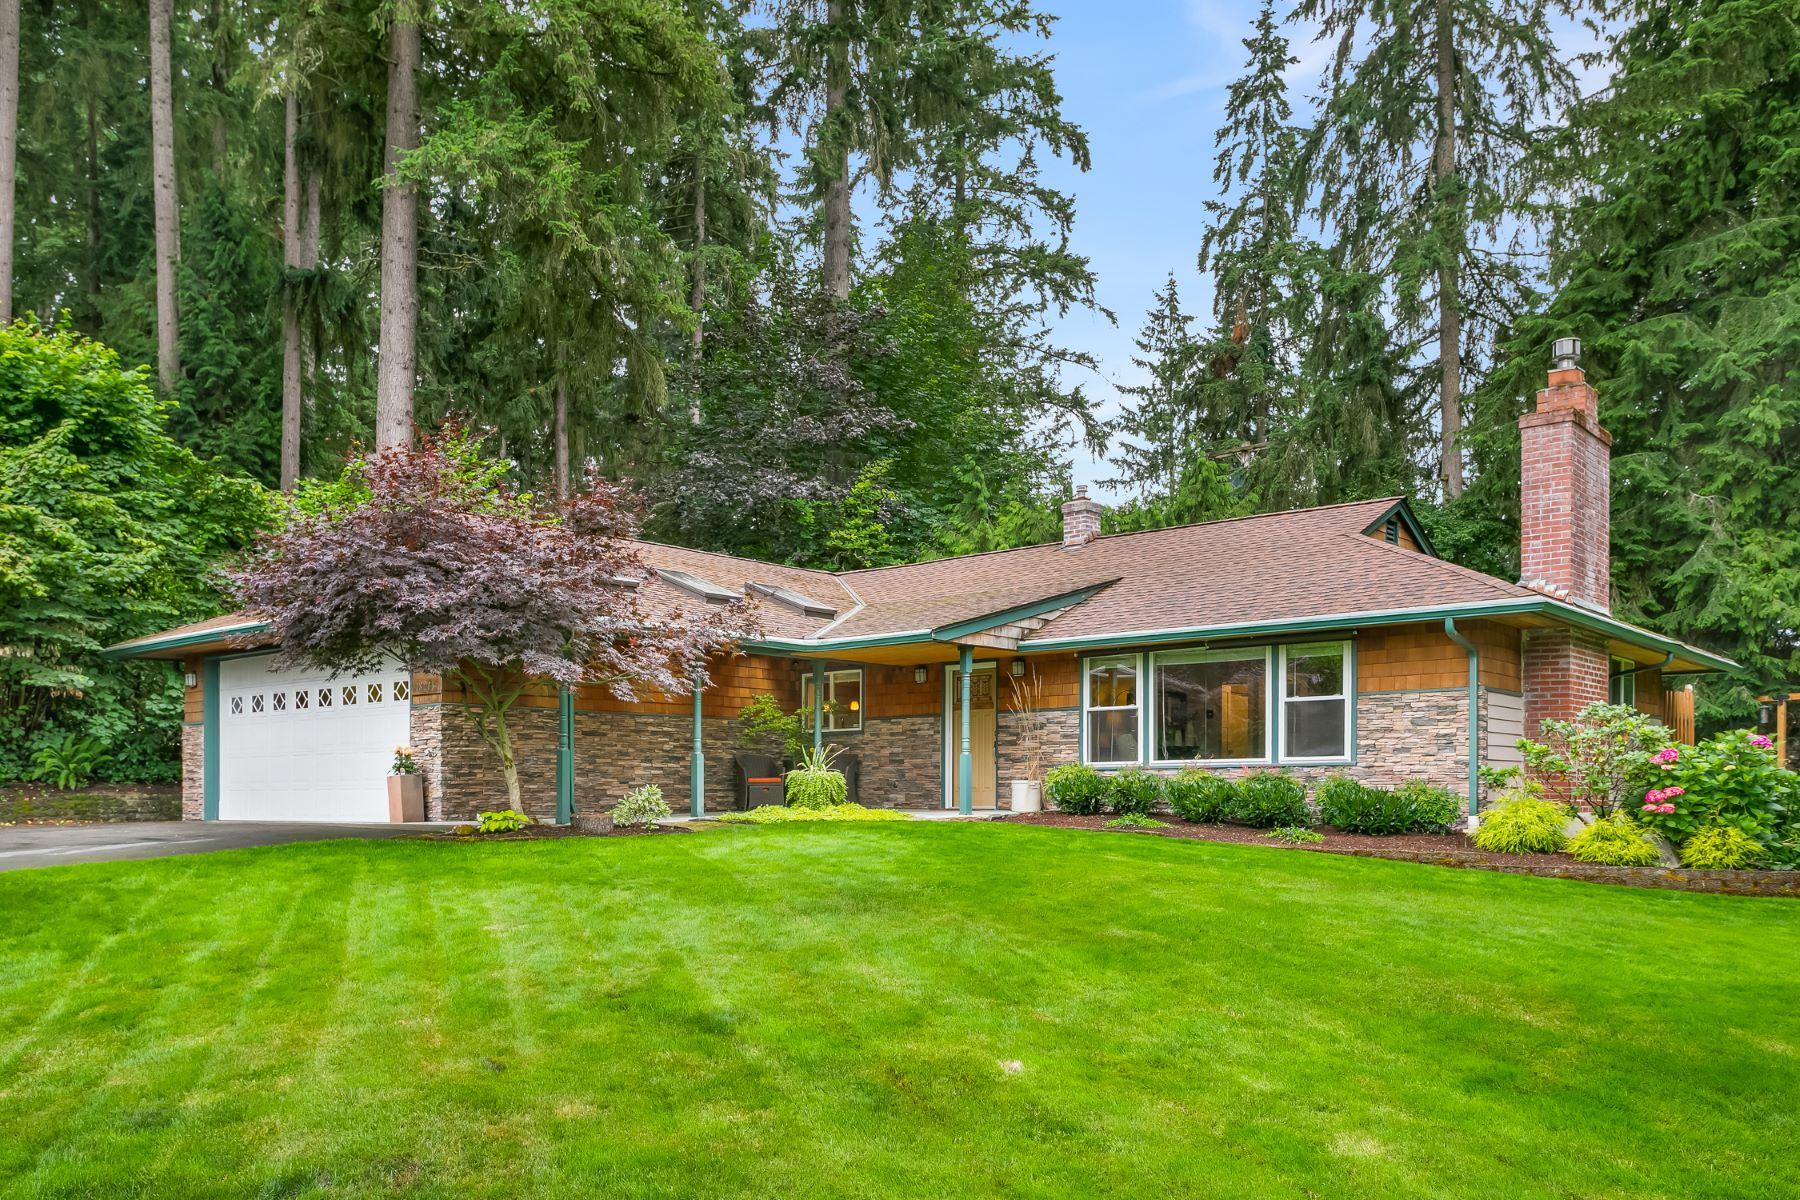 Single Family Homes for Sale at Lake Leota Farms 18205 167th Ave NE Woodinville, Washington 98072 United States